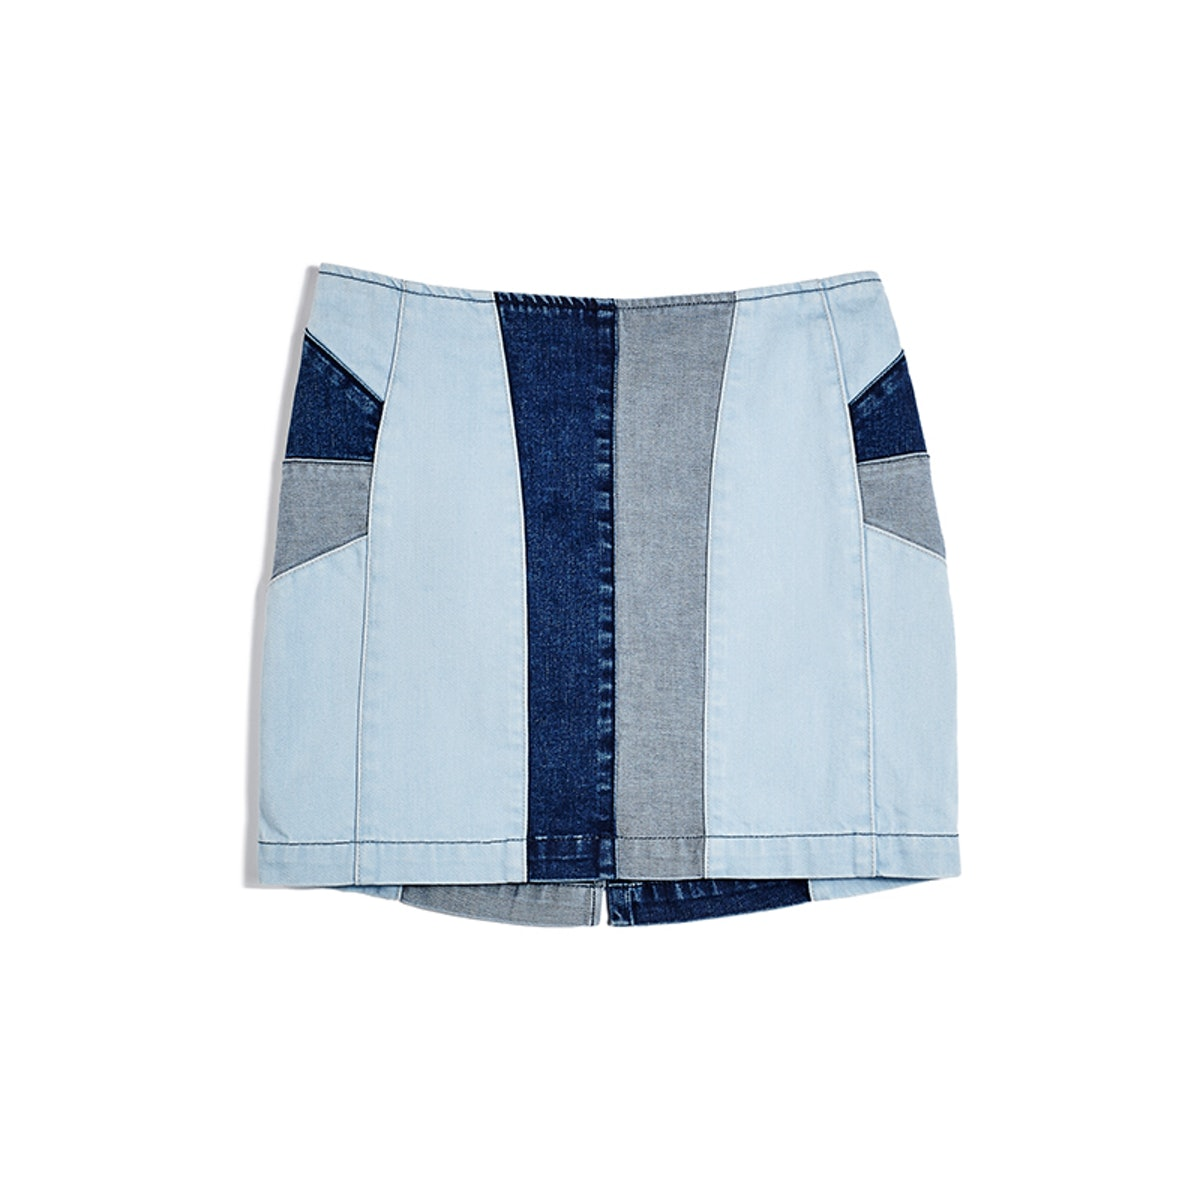 Patched Denim Miniskirt